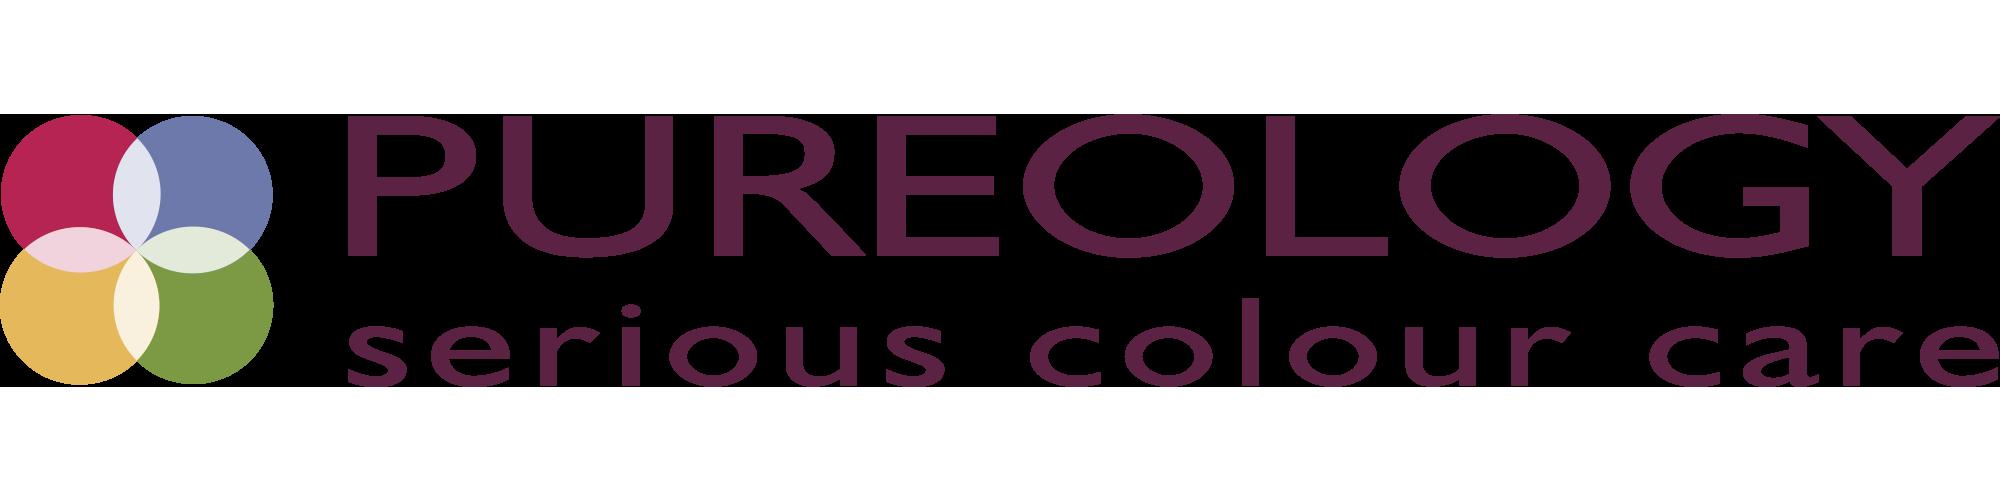 pureology_logo (1)